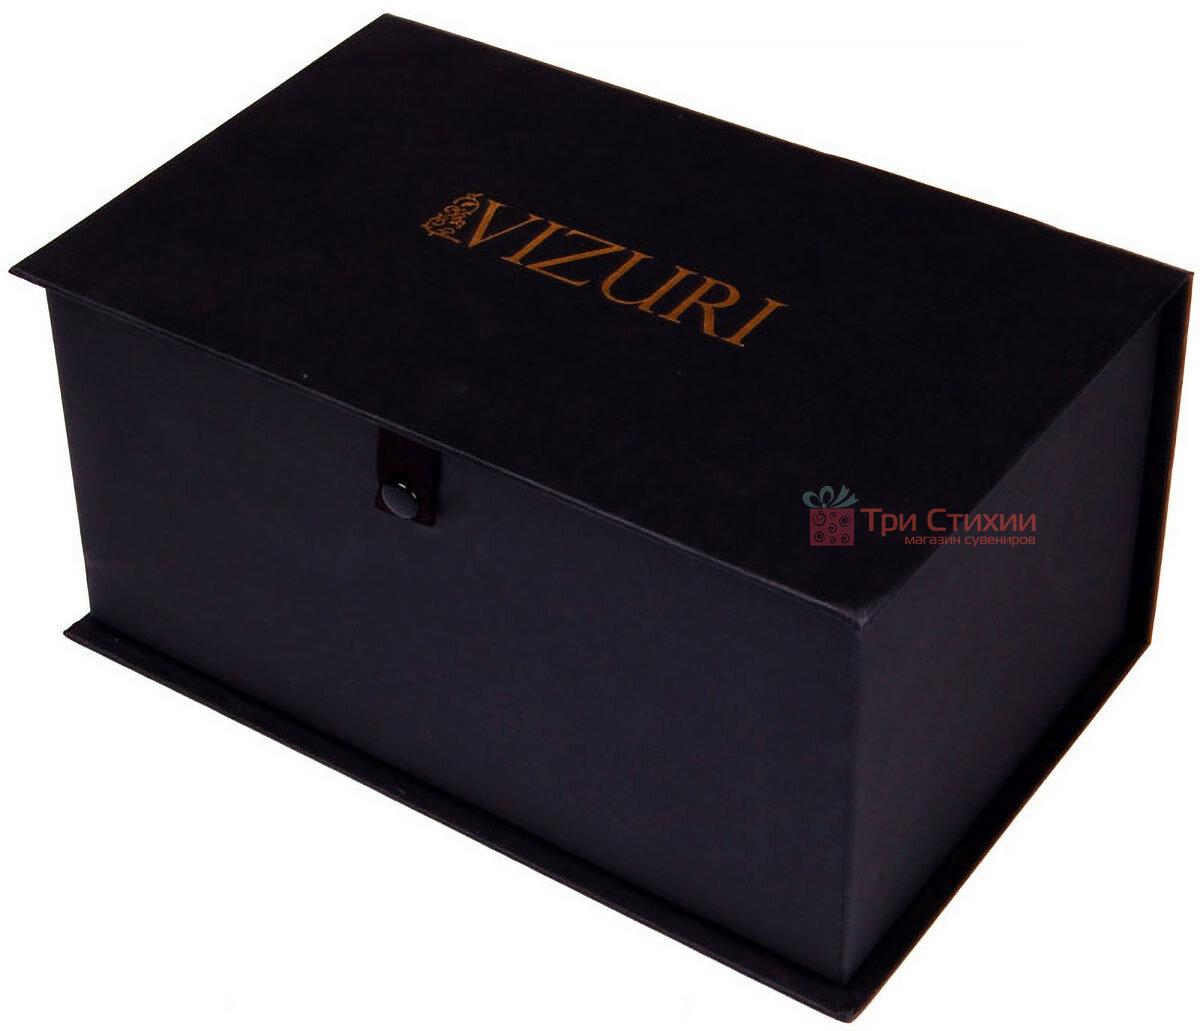 Статуэтка из бронзы «Инвестор» Vizuri (Визури) B02, фото 5